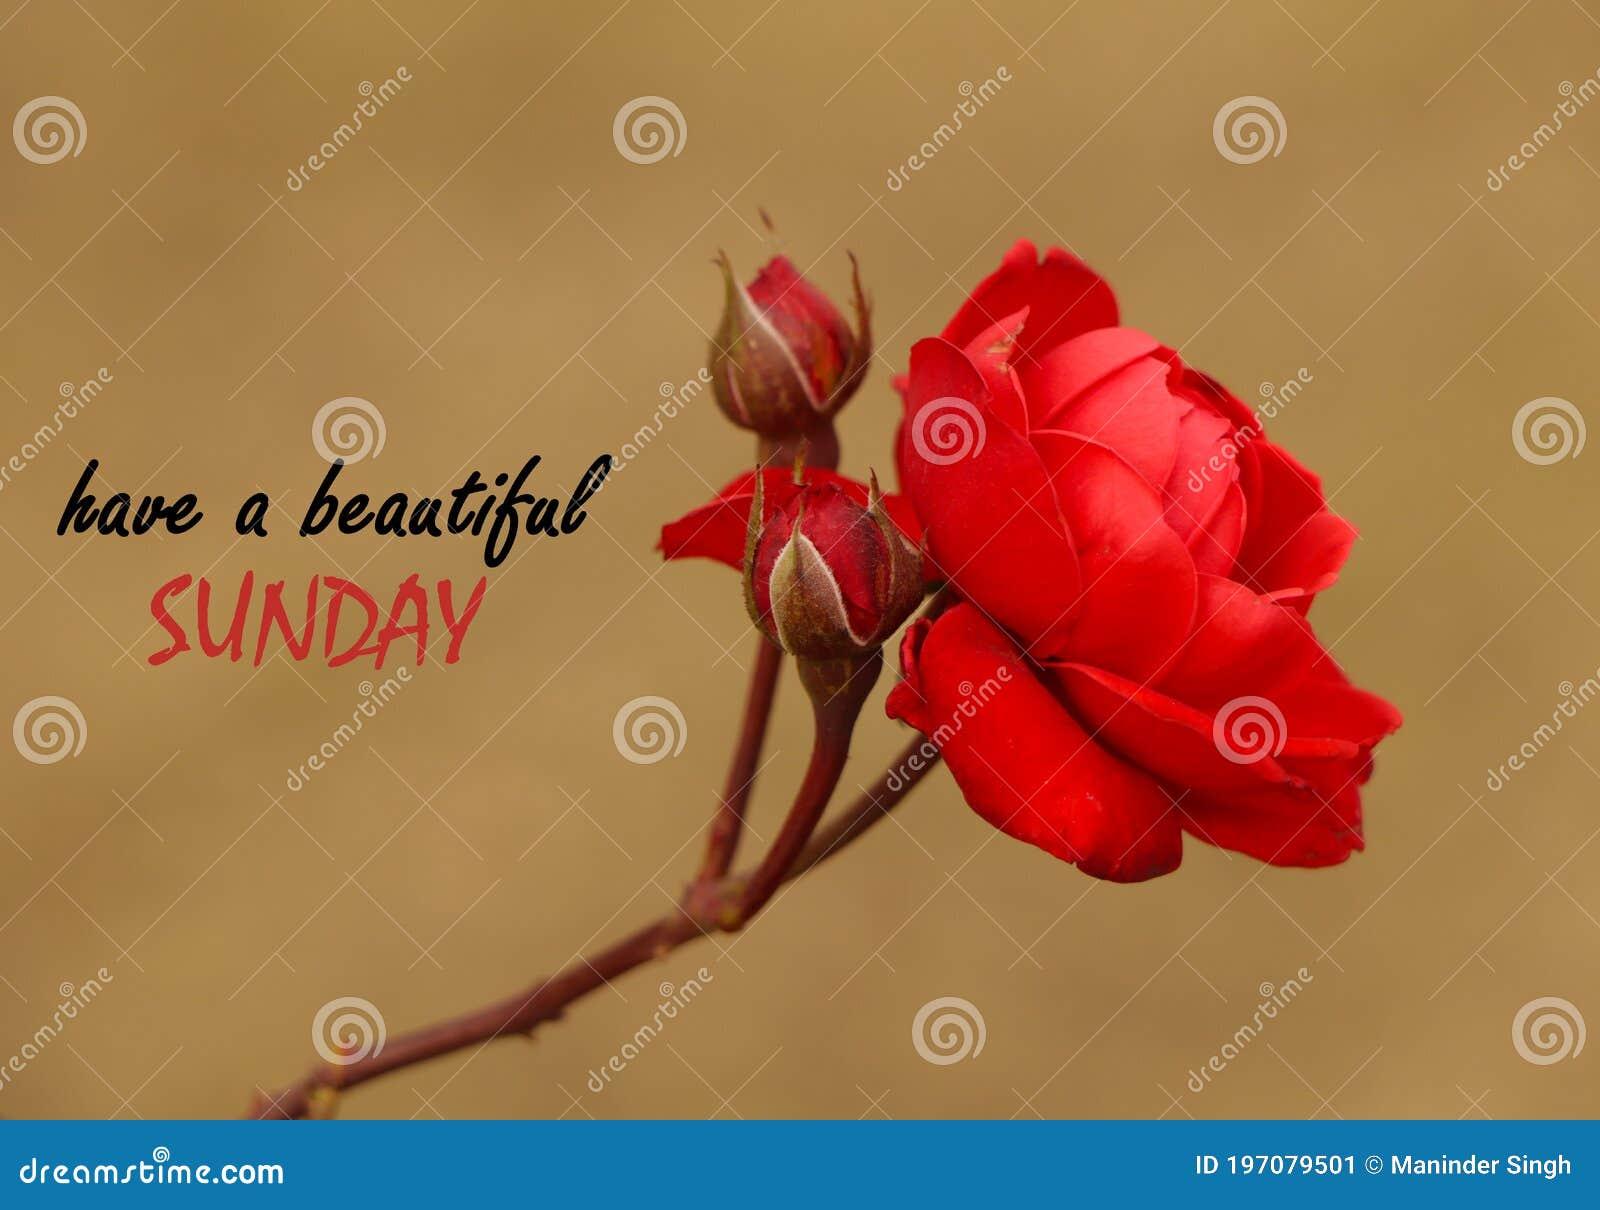 20,20 Beautiful Sunday Photos   Free & Royalty Free Stock Photos ...